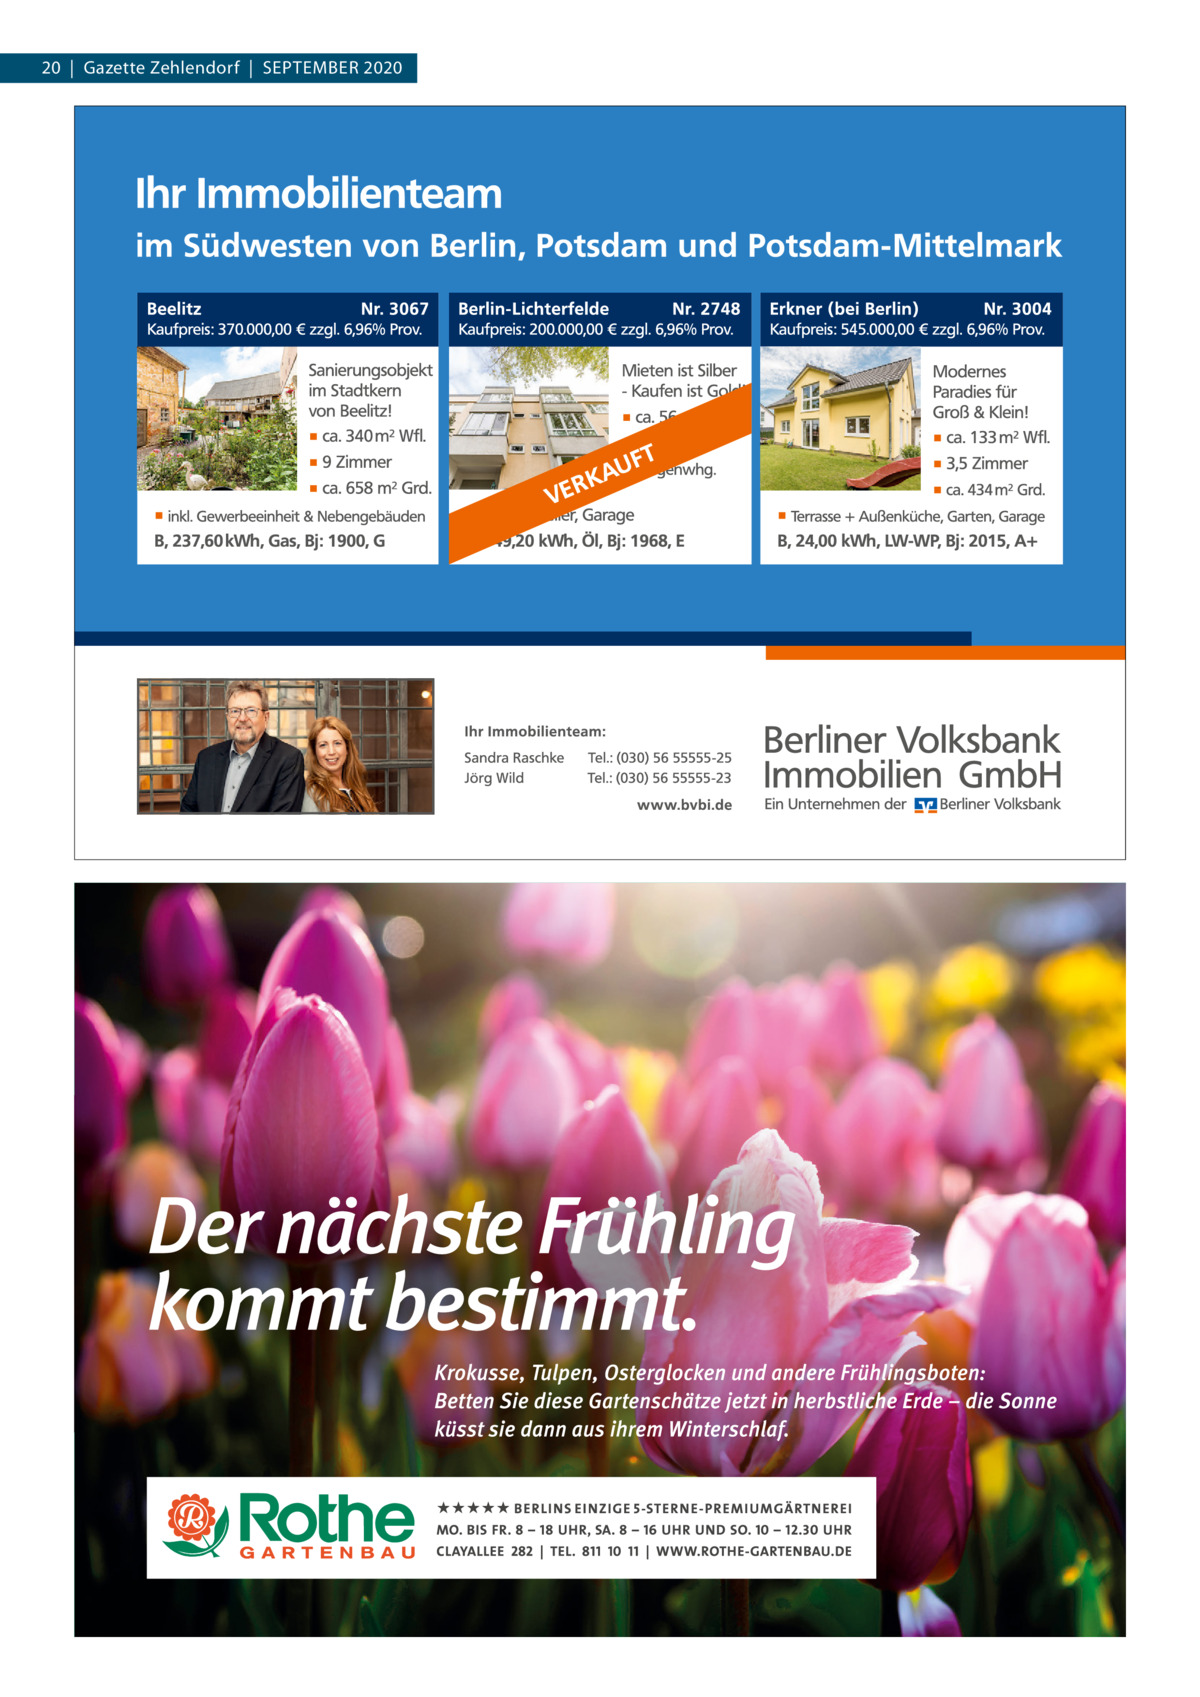 20|Gazette Zehlendorf|September 2020